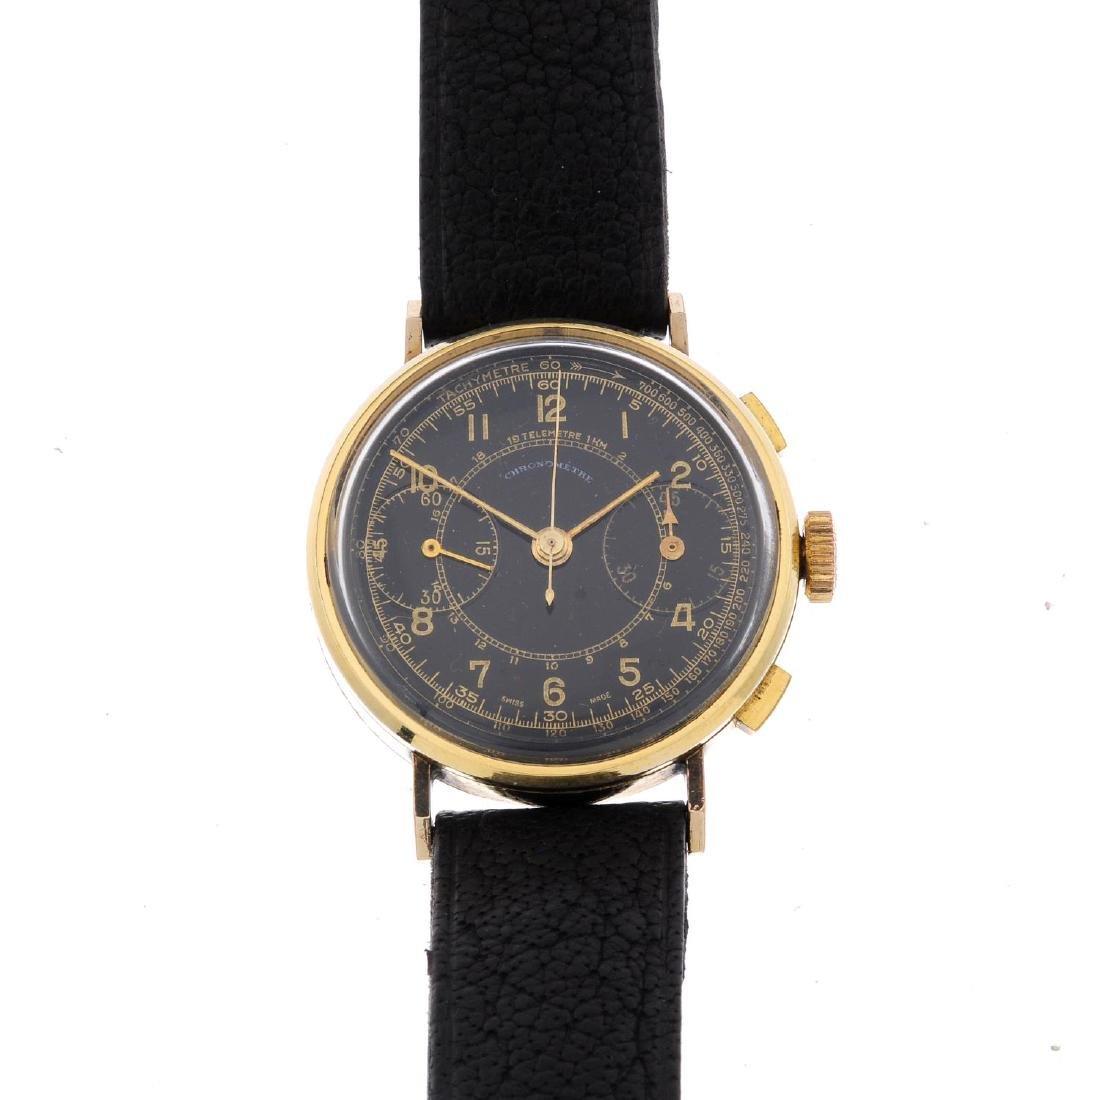 A gentleman's chronograph wrist watch. Gold plated